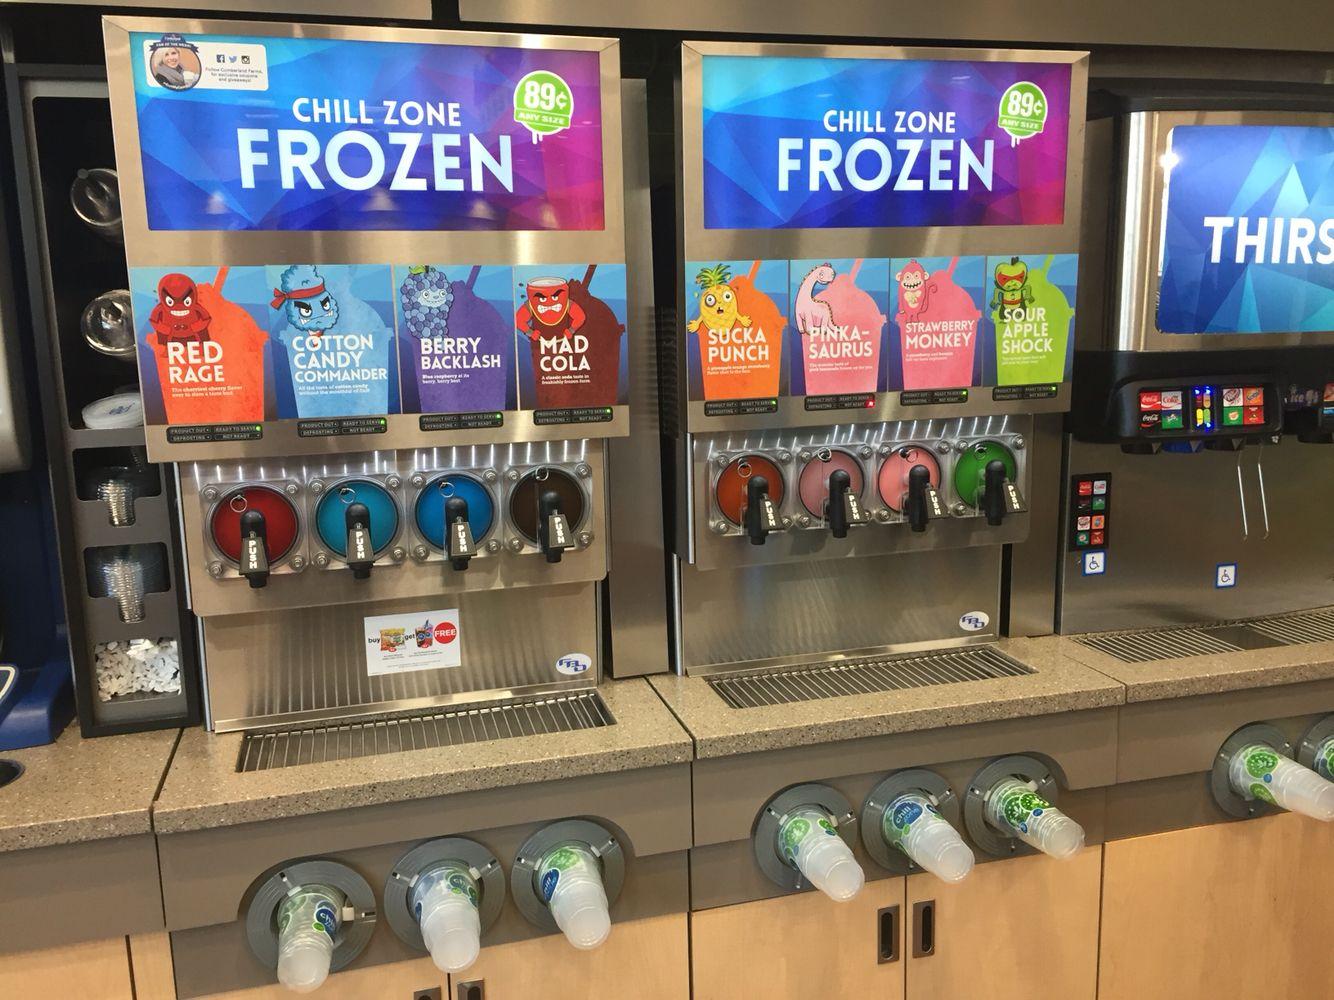 Chill zone slushy Cumberland farms  Special drinks